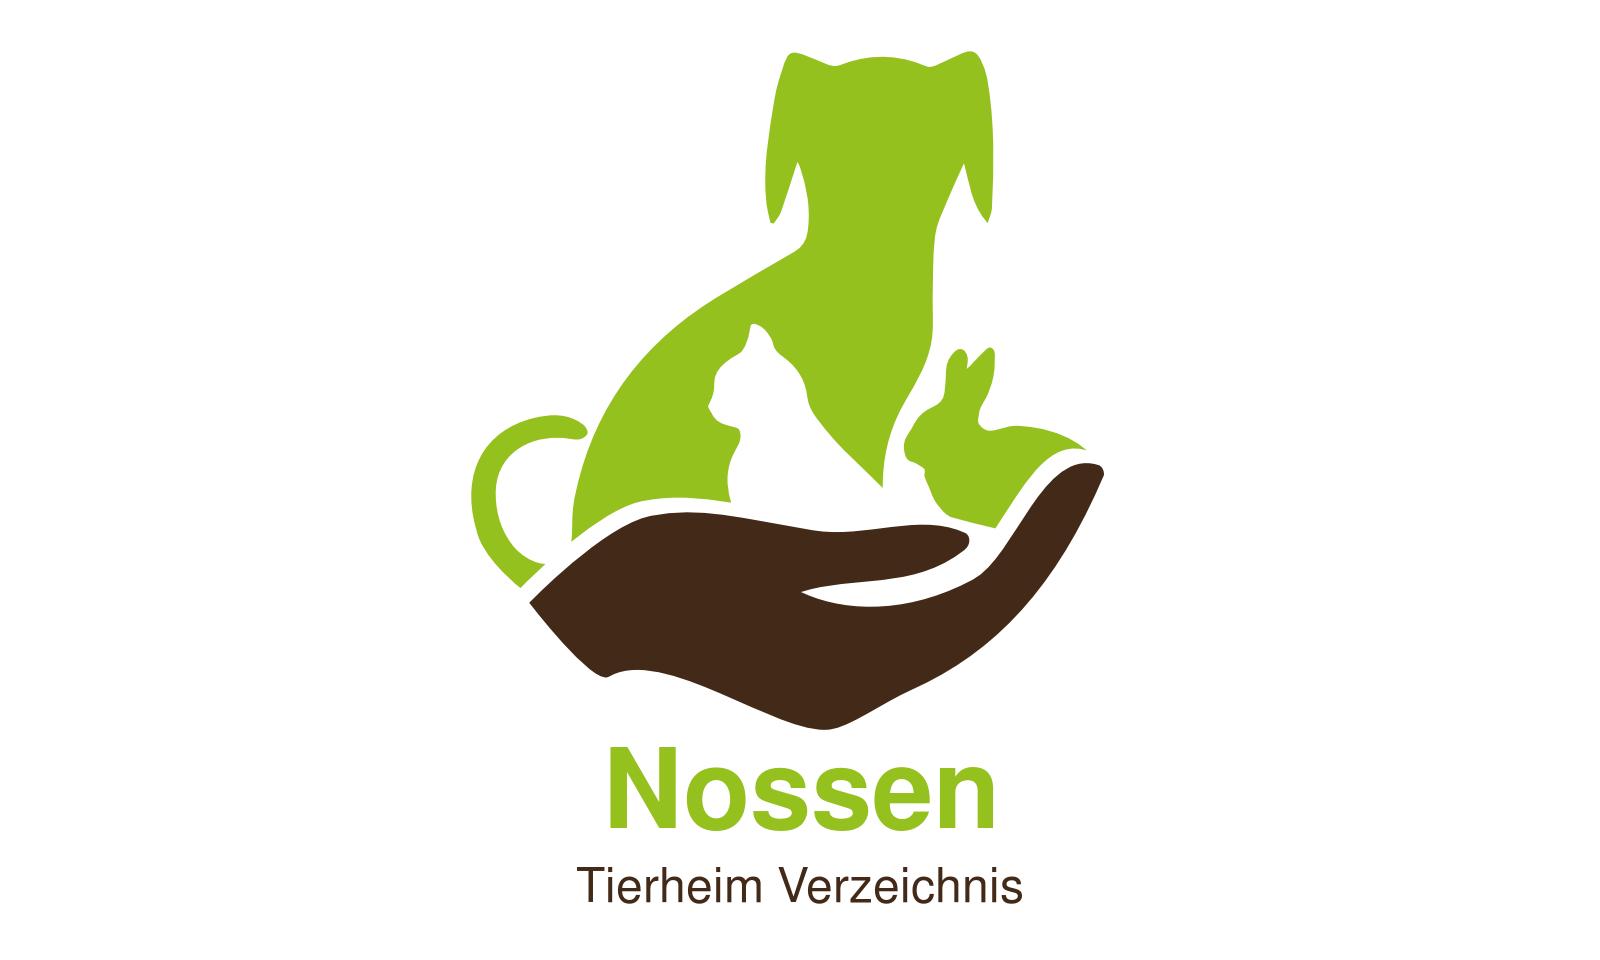 Tierheim Nossen